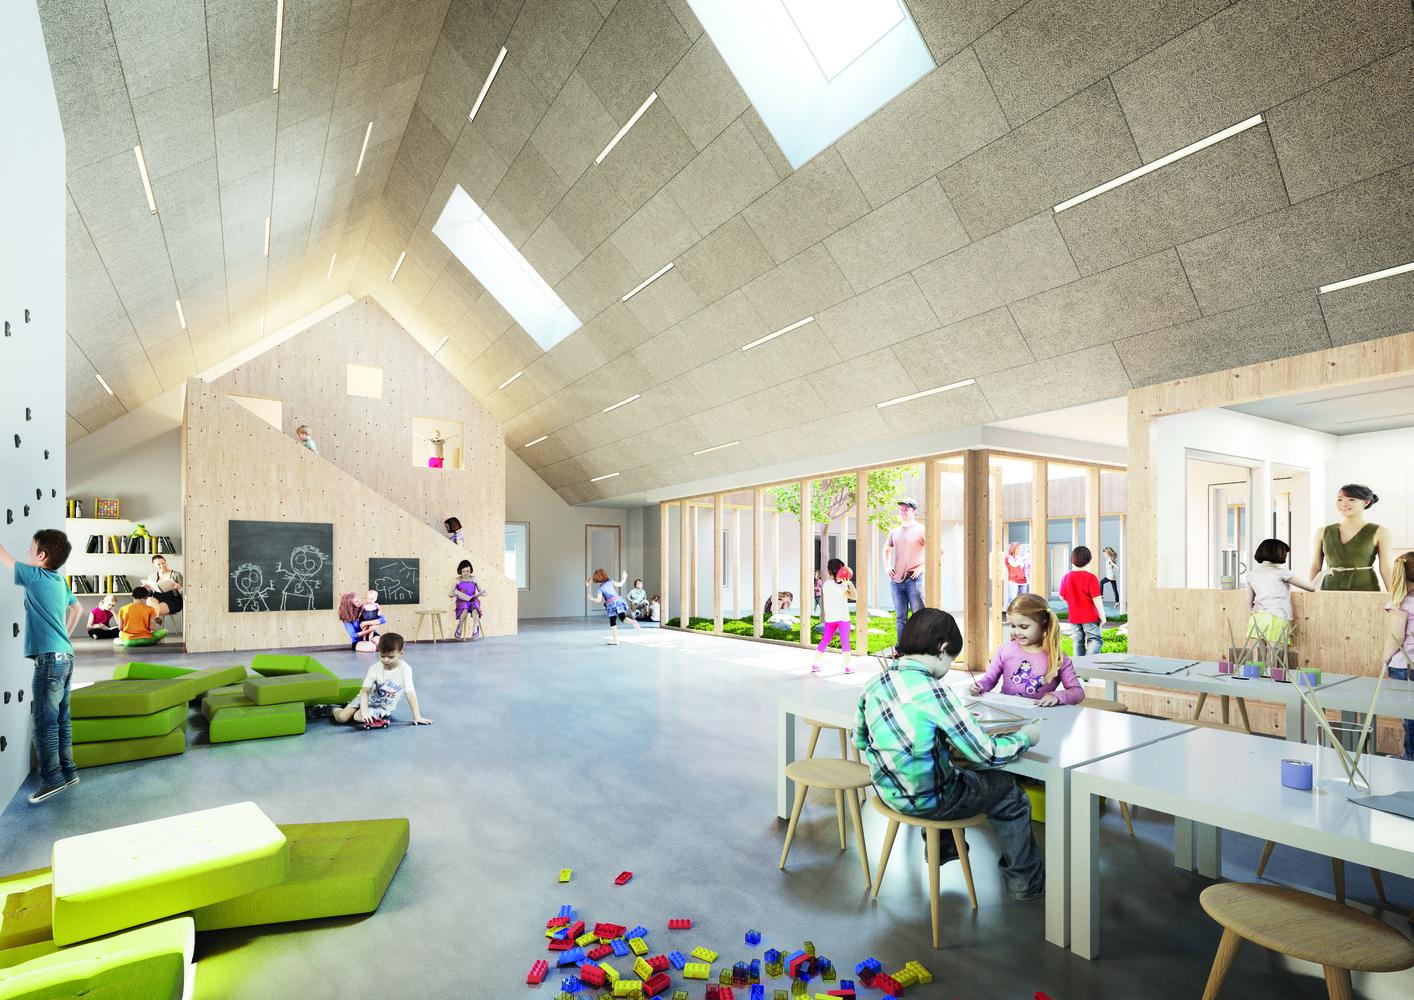 Galaxen Day Care Center Render Interior Common Dimension Design